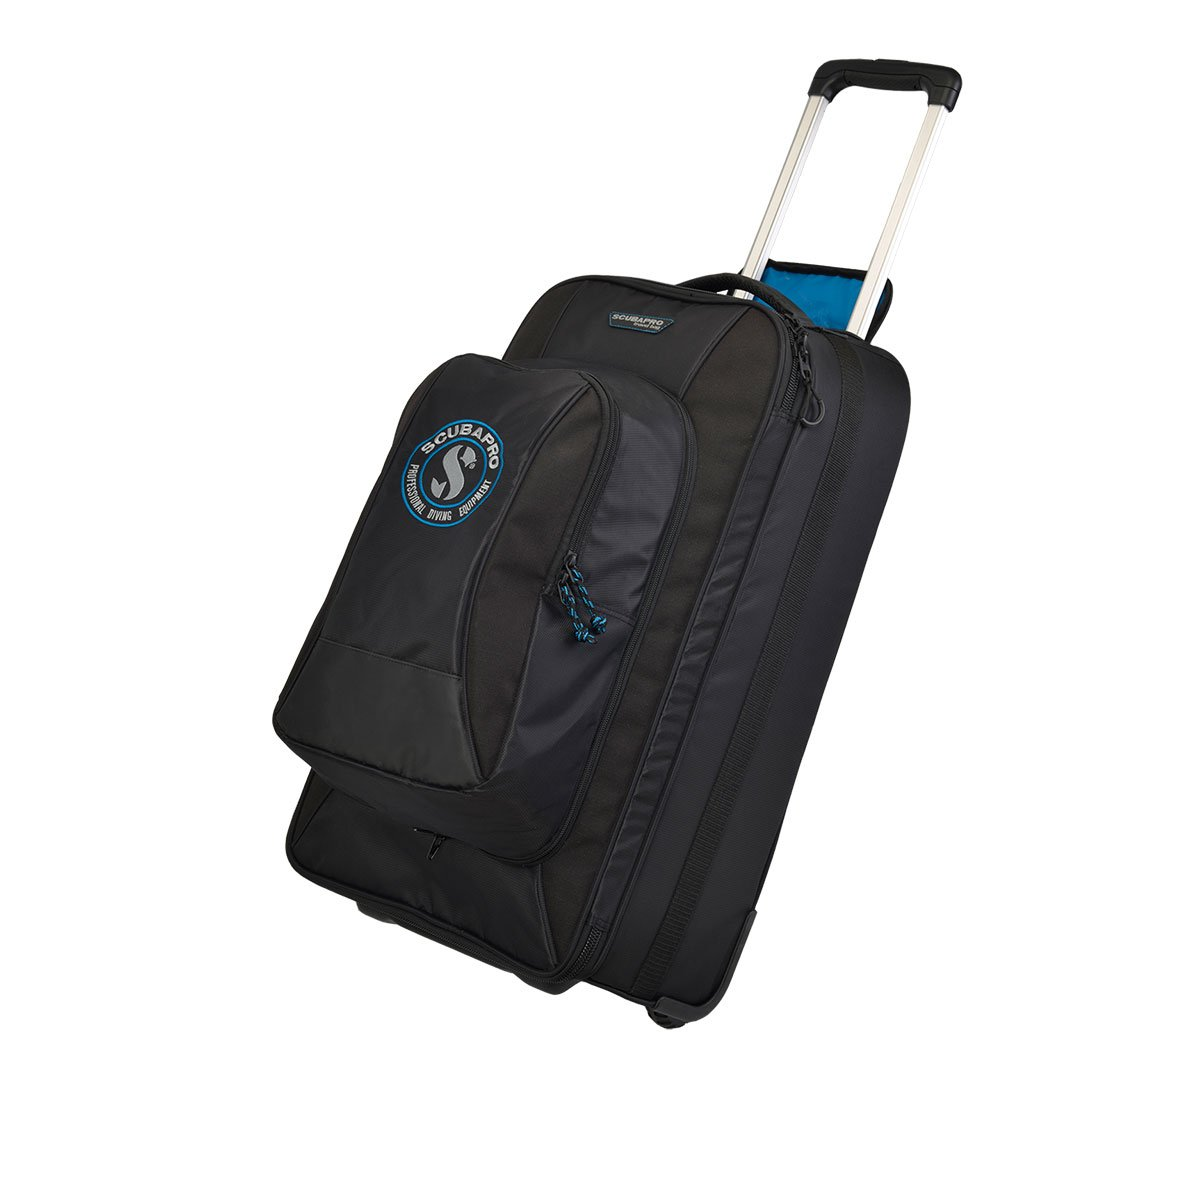 Scuba Pro Travel Bag